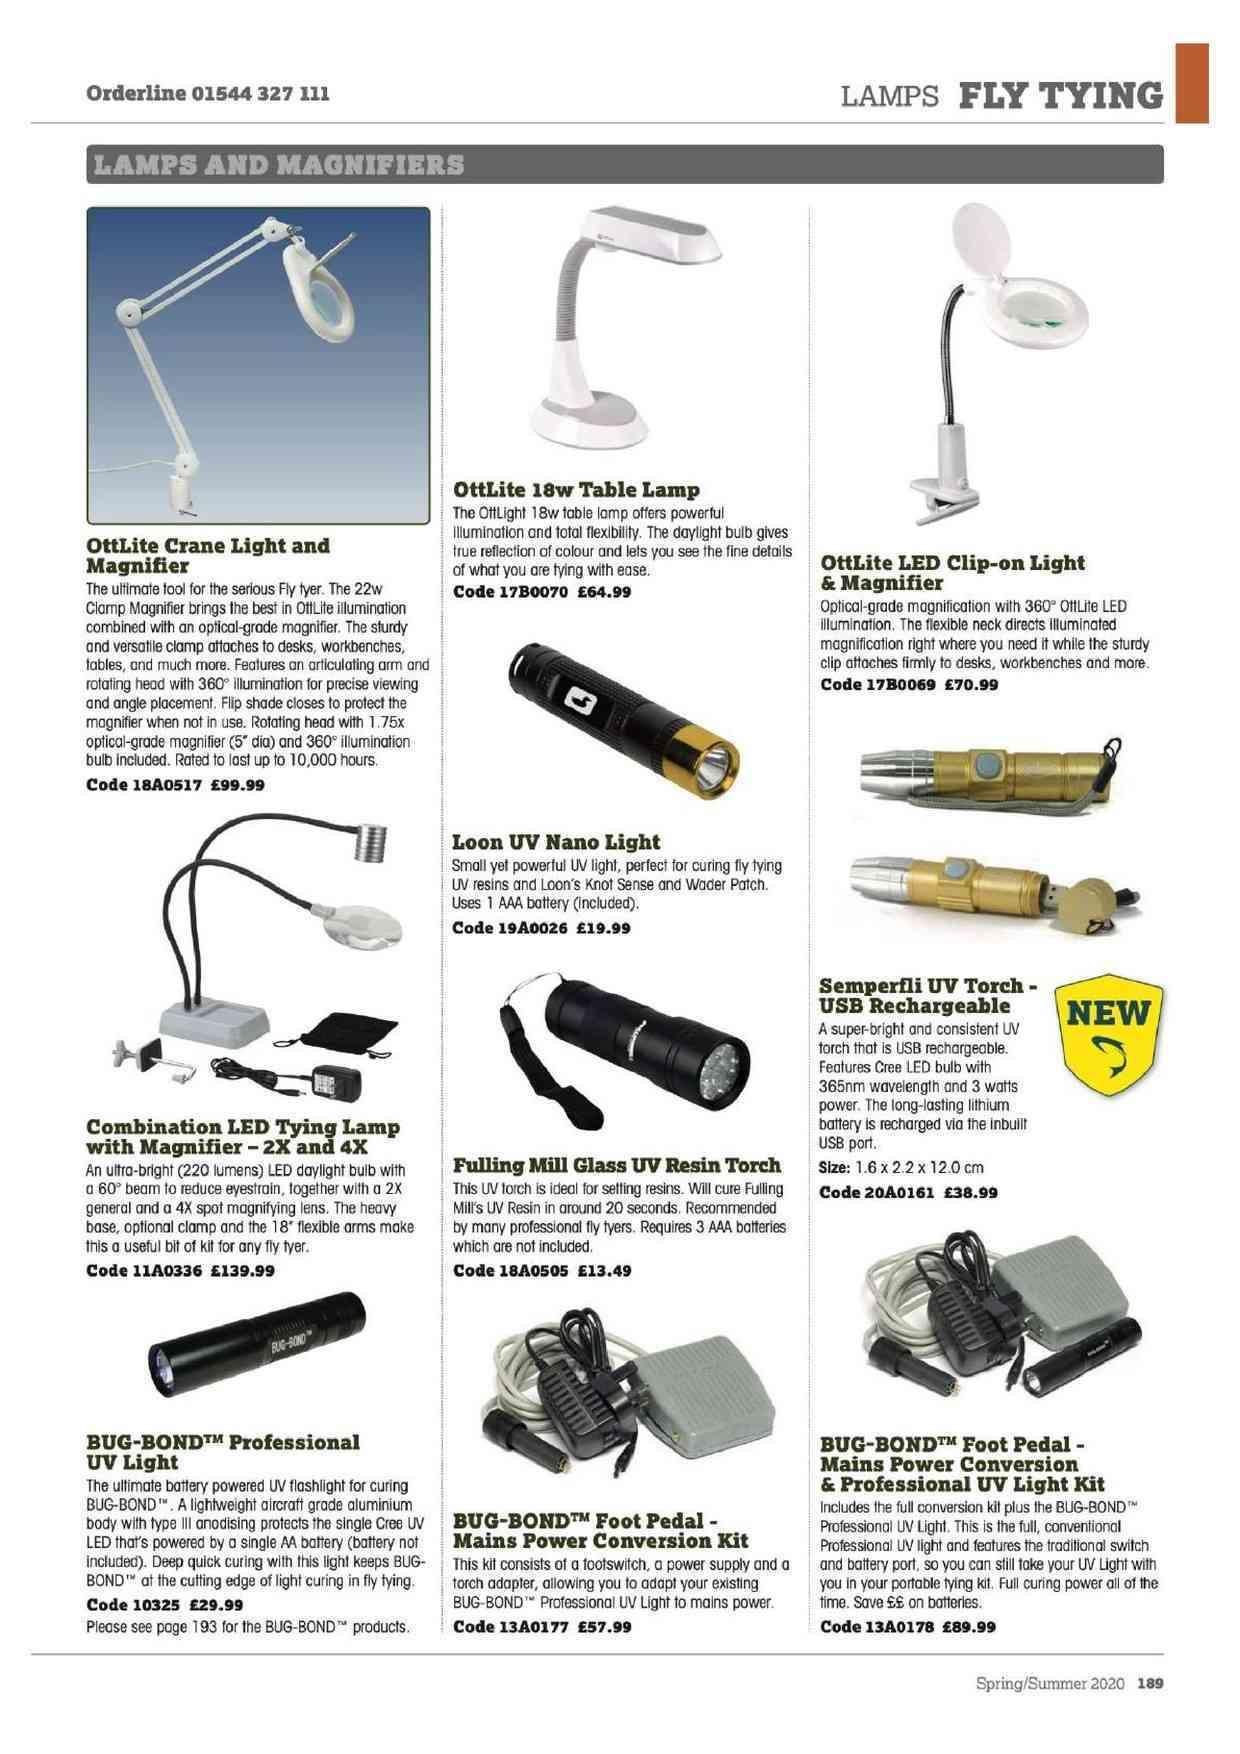 Bug Bond Professional UV Light Mains Footswitch Conversion